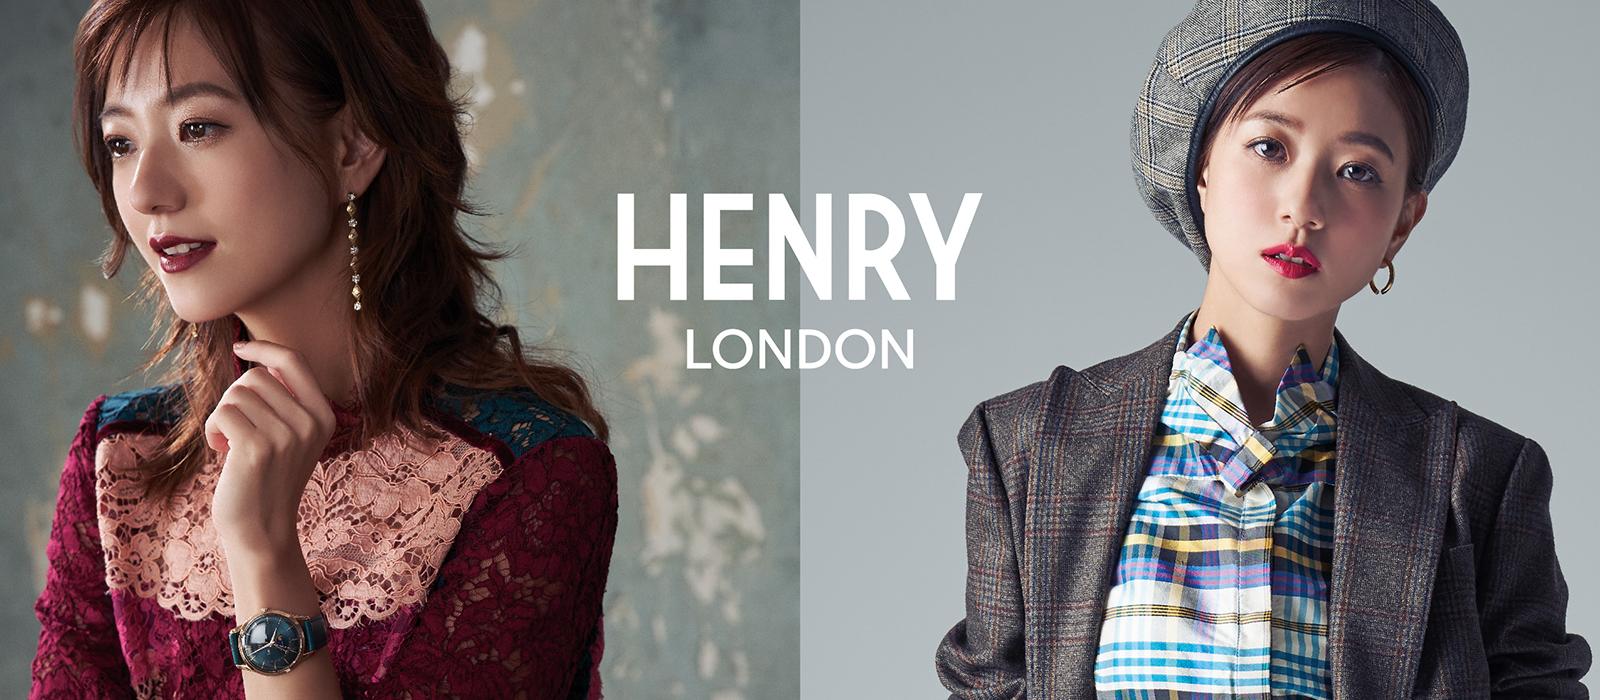 「HENRY LONDON」日本アンバサダーに抜擢された伊藤千晃(提供写真)